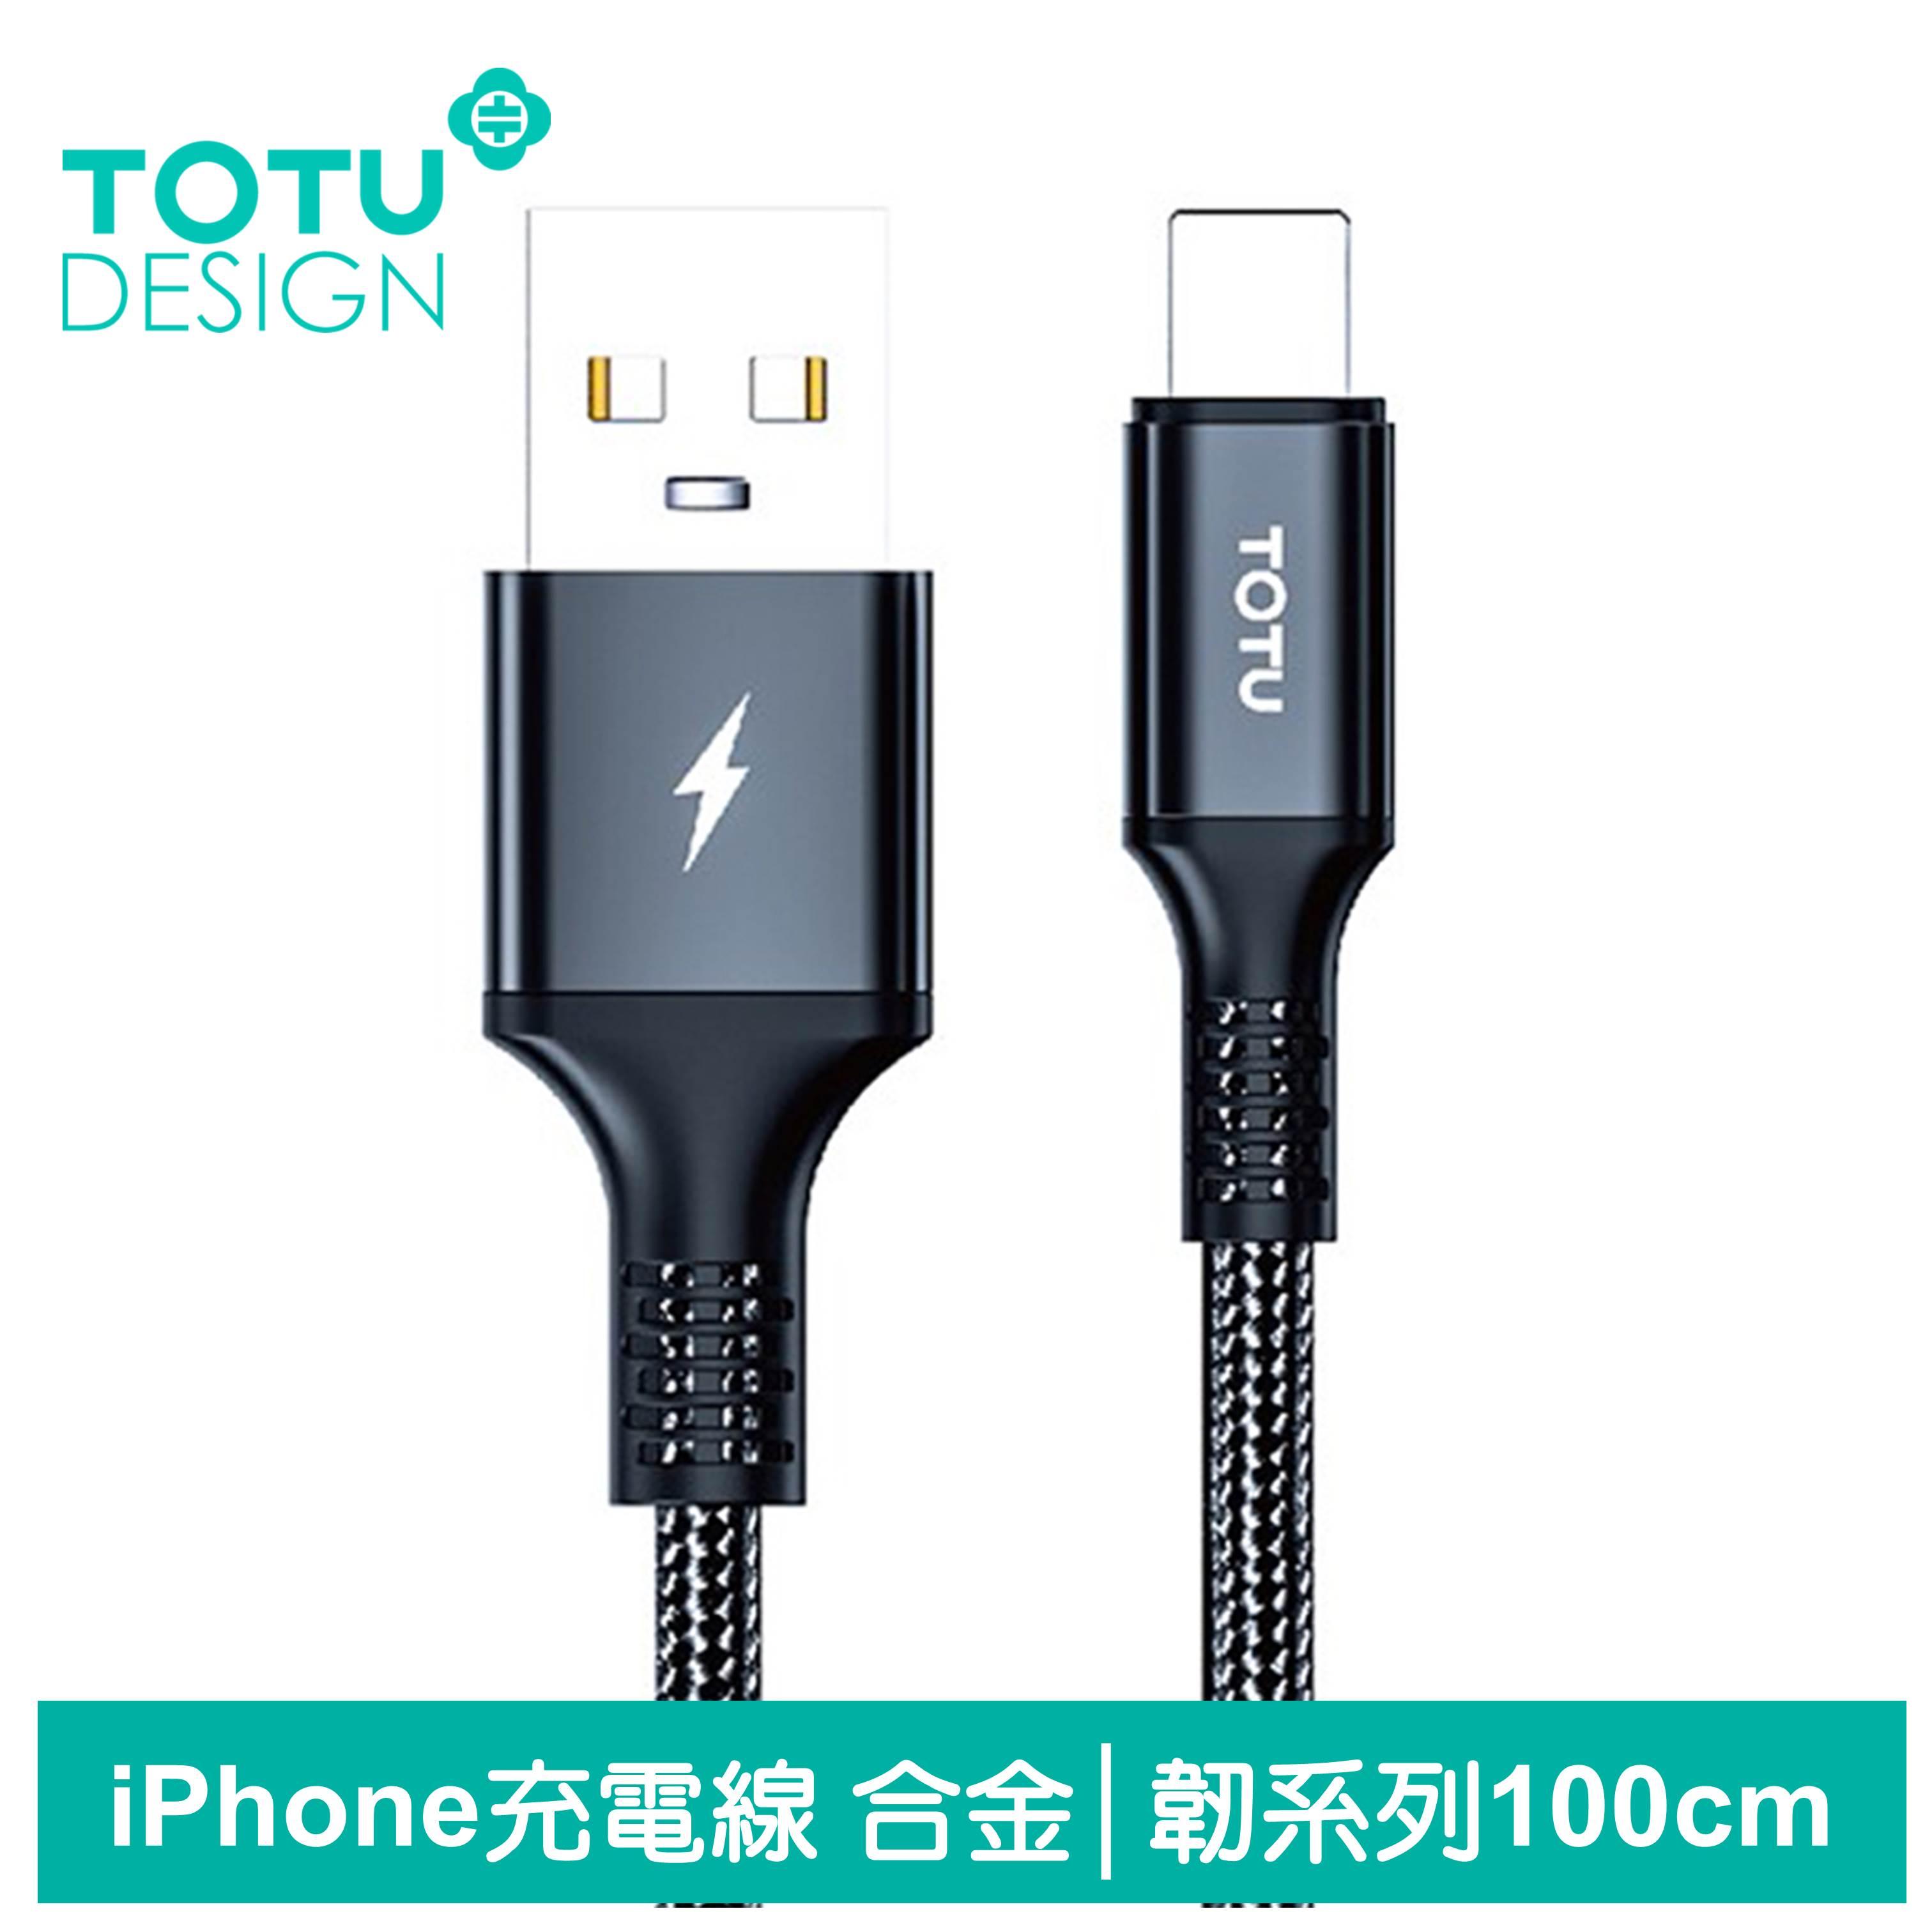 TOTU台灣官方 Lightning/iPhone充電線傳輸線快充線編織線 2A快充 韌系列 100cm 黑色